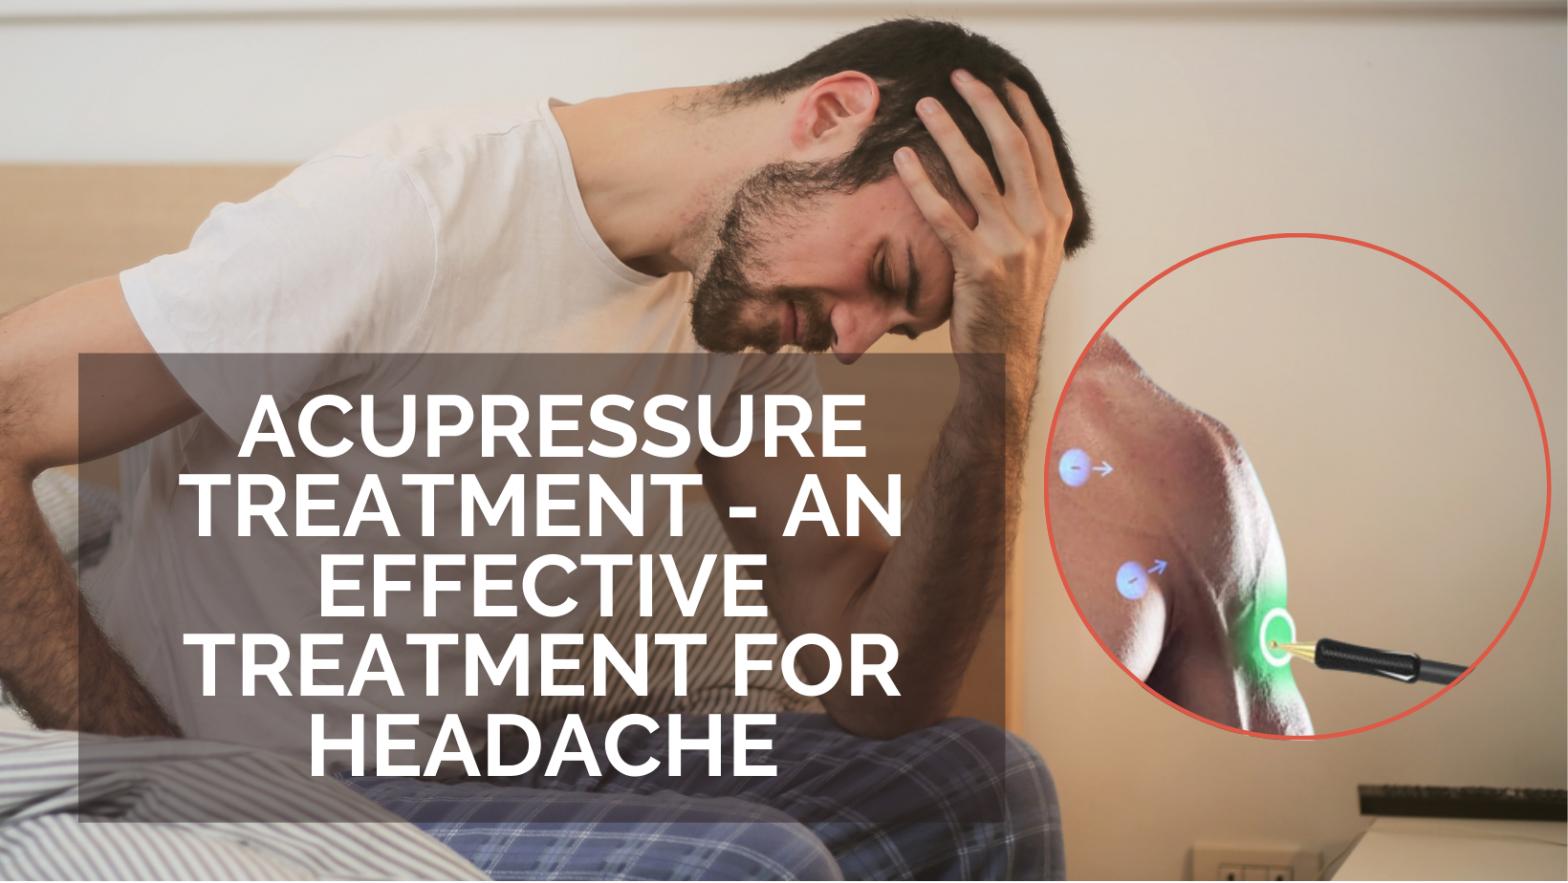 An Effective Treatment for Headache